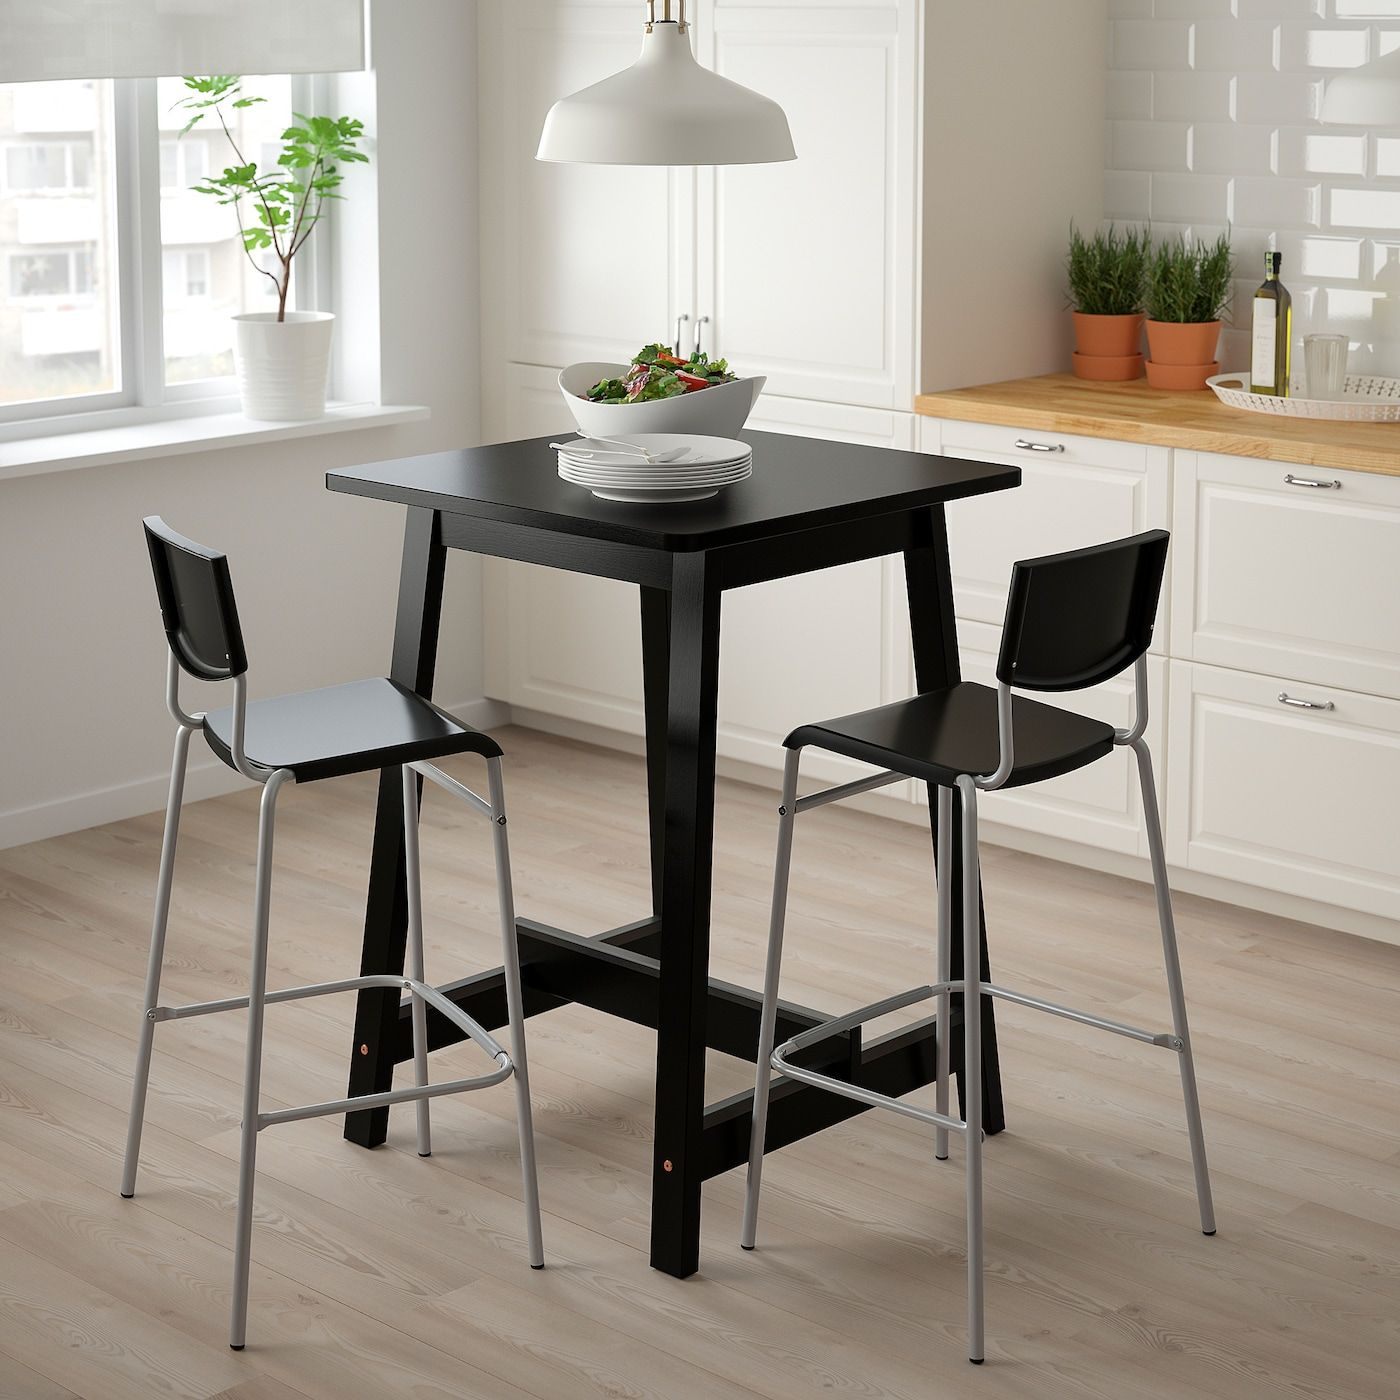 IKEA STIG Bar stool with backrest   Barkruk, Voetsteun, Vermoeide ...